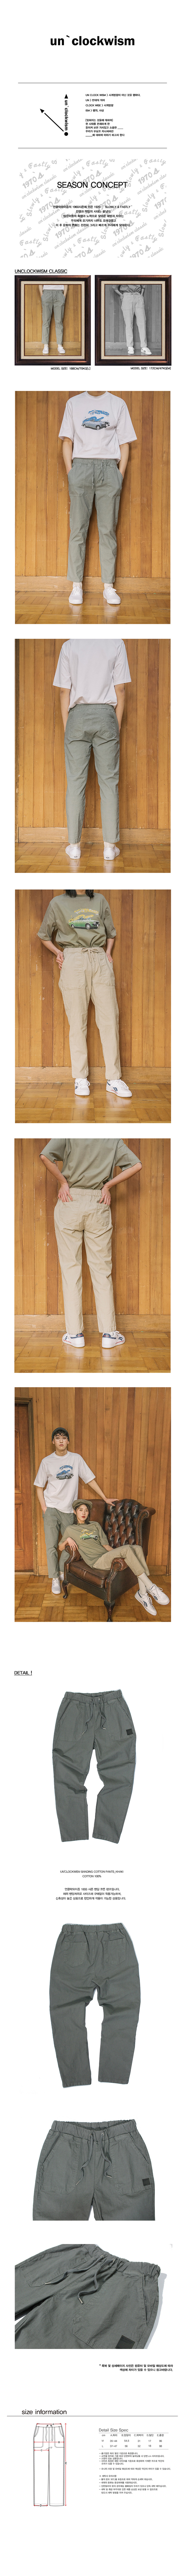 unclockwism banding cotton pantst_khaki.jpg